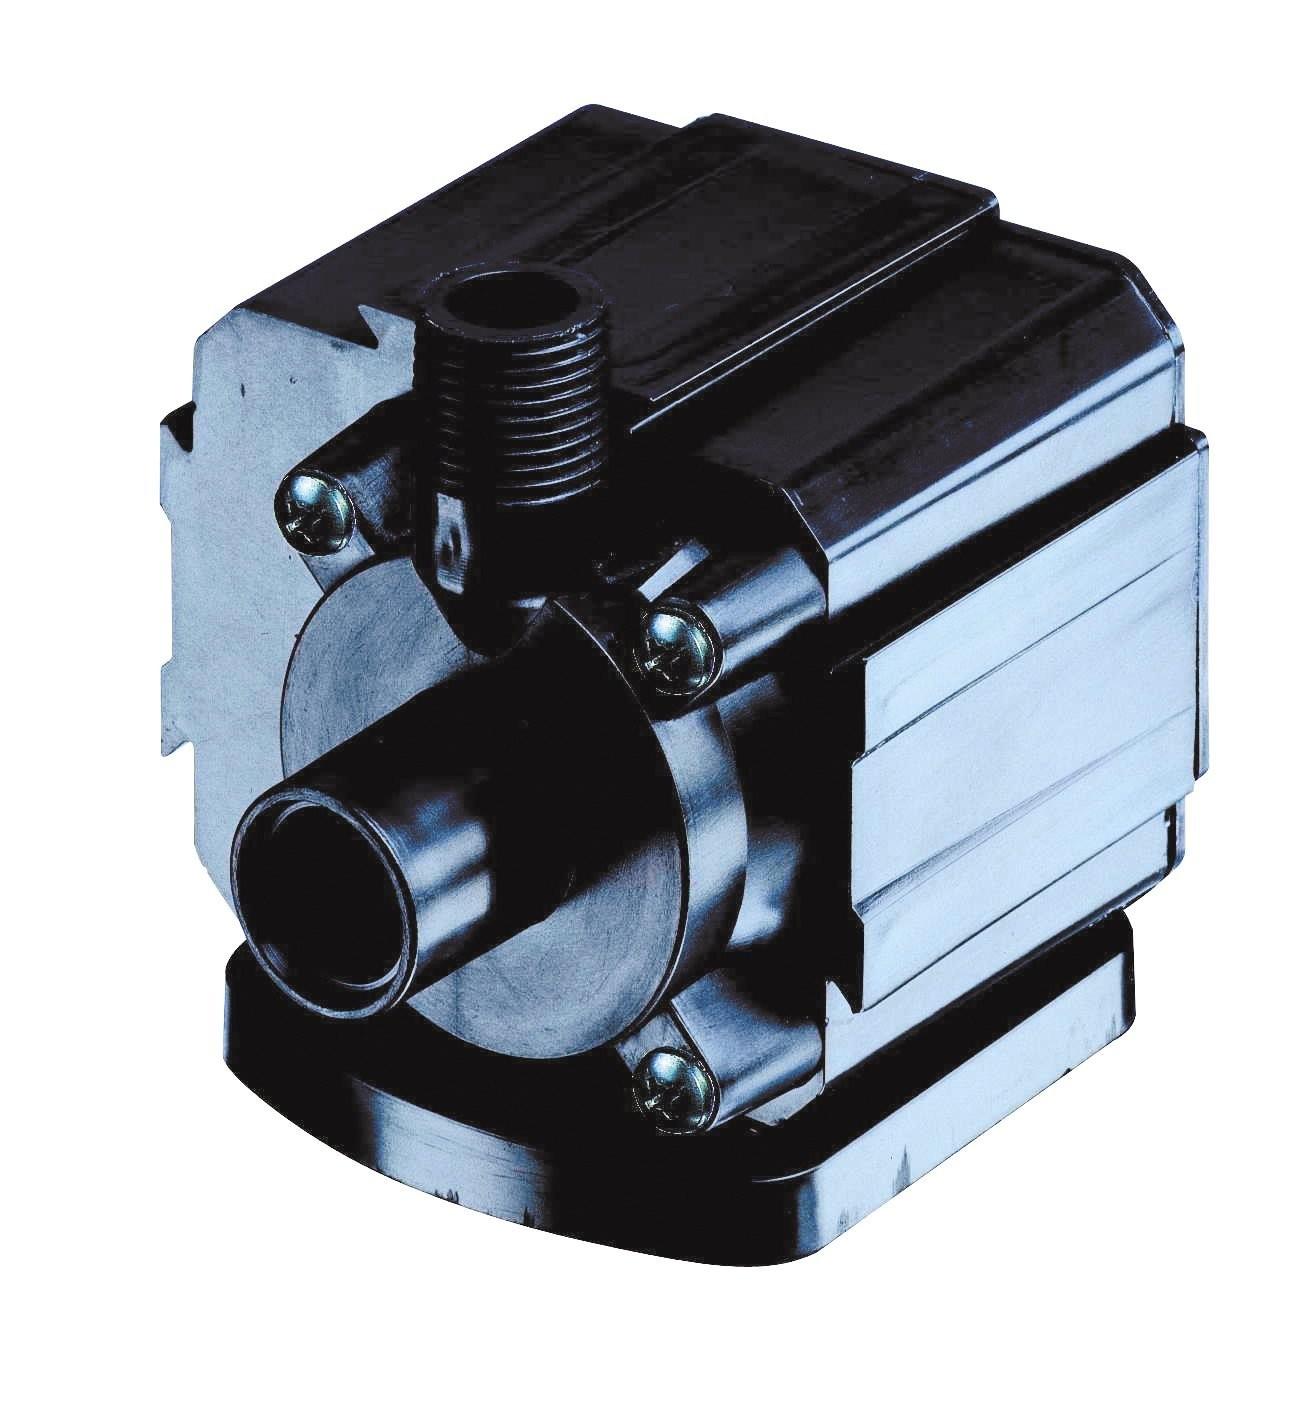 Pondmaster - Pond-Mag - PM2 - 250 GPH Submersible Pump - 18ft Power Cord